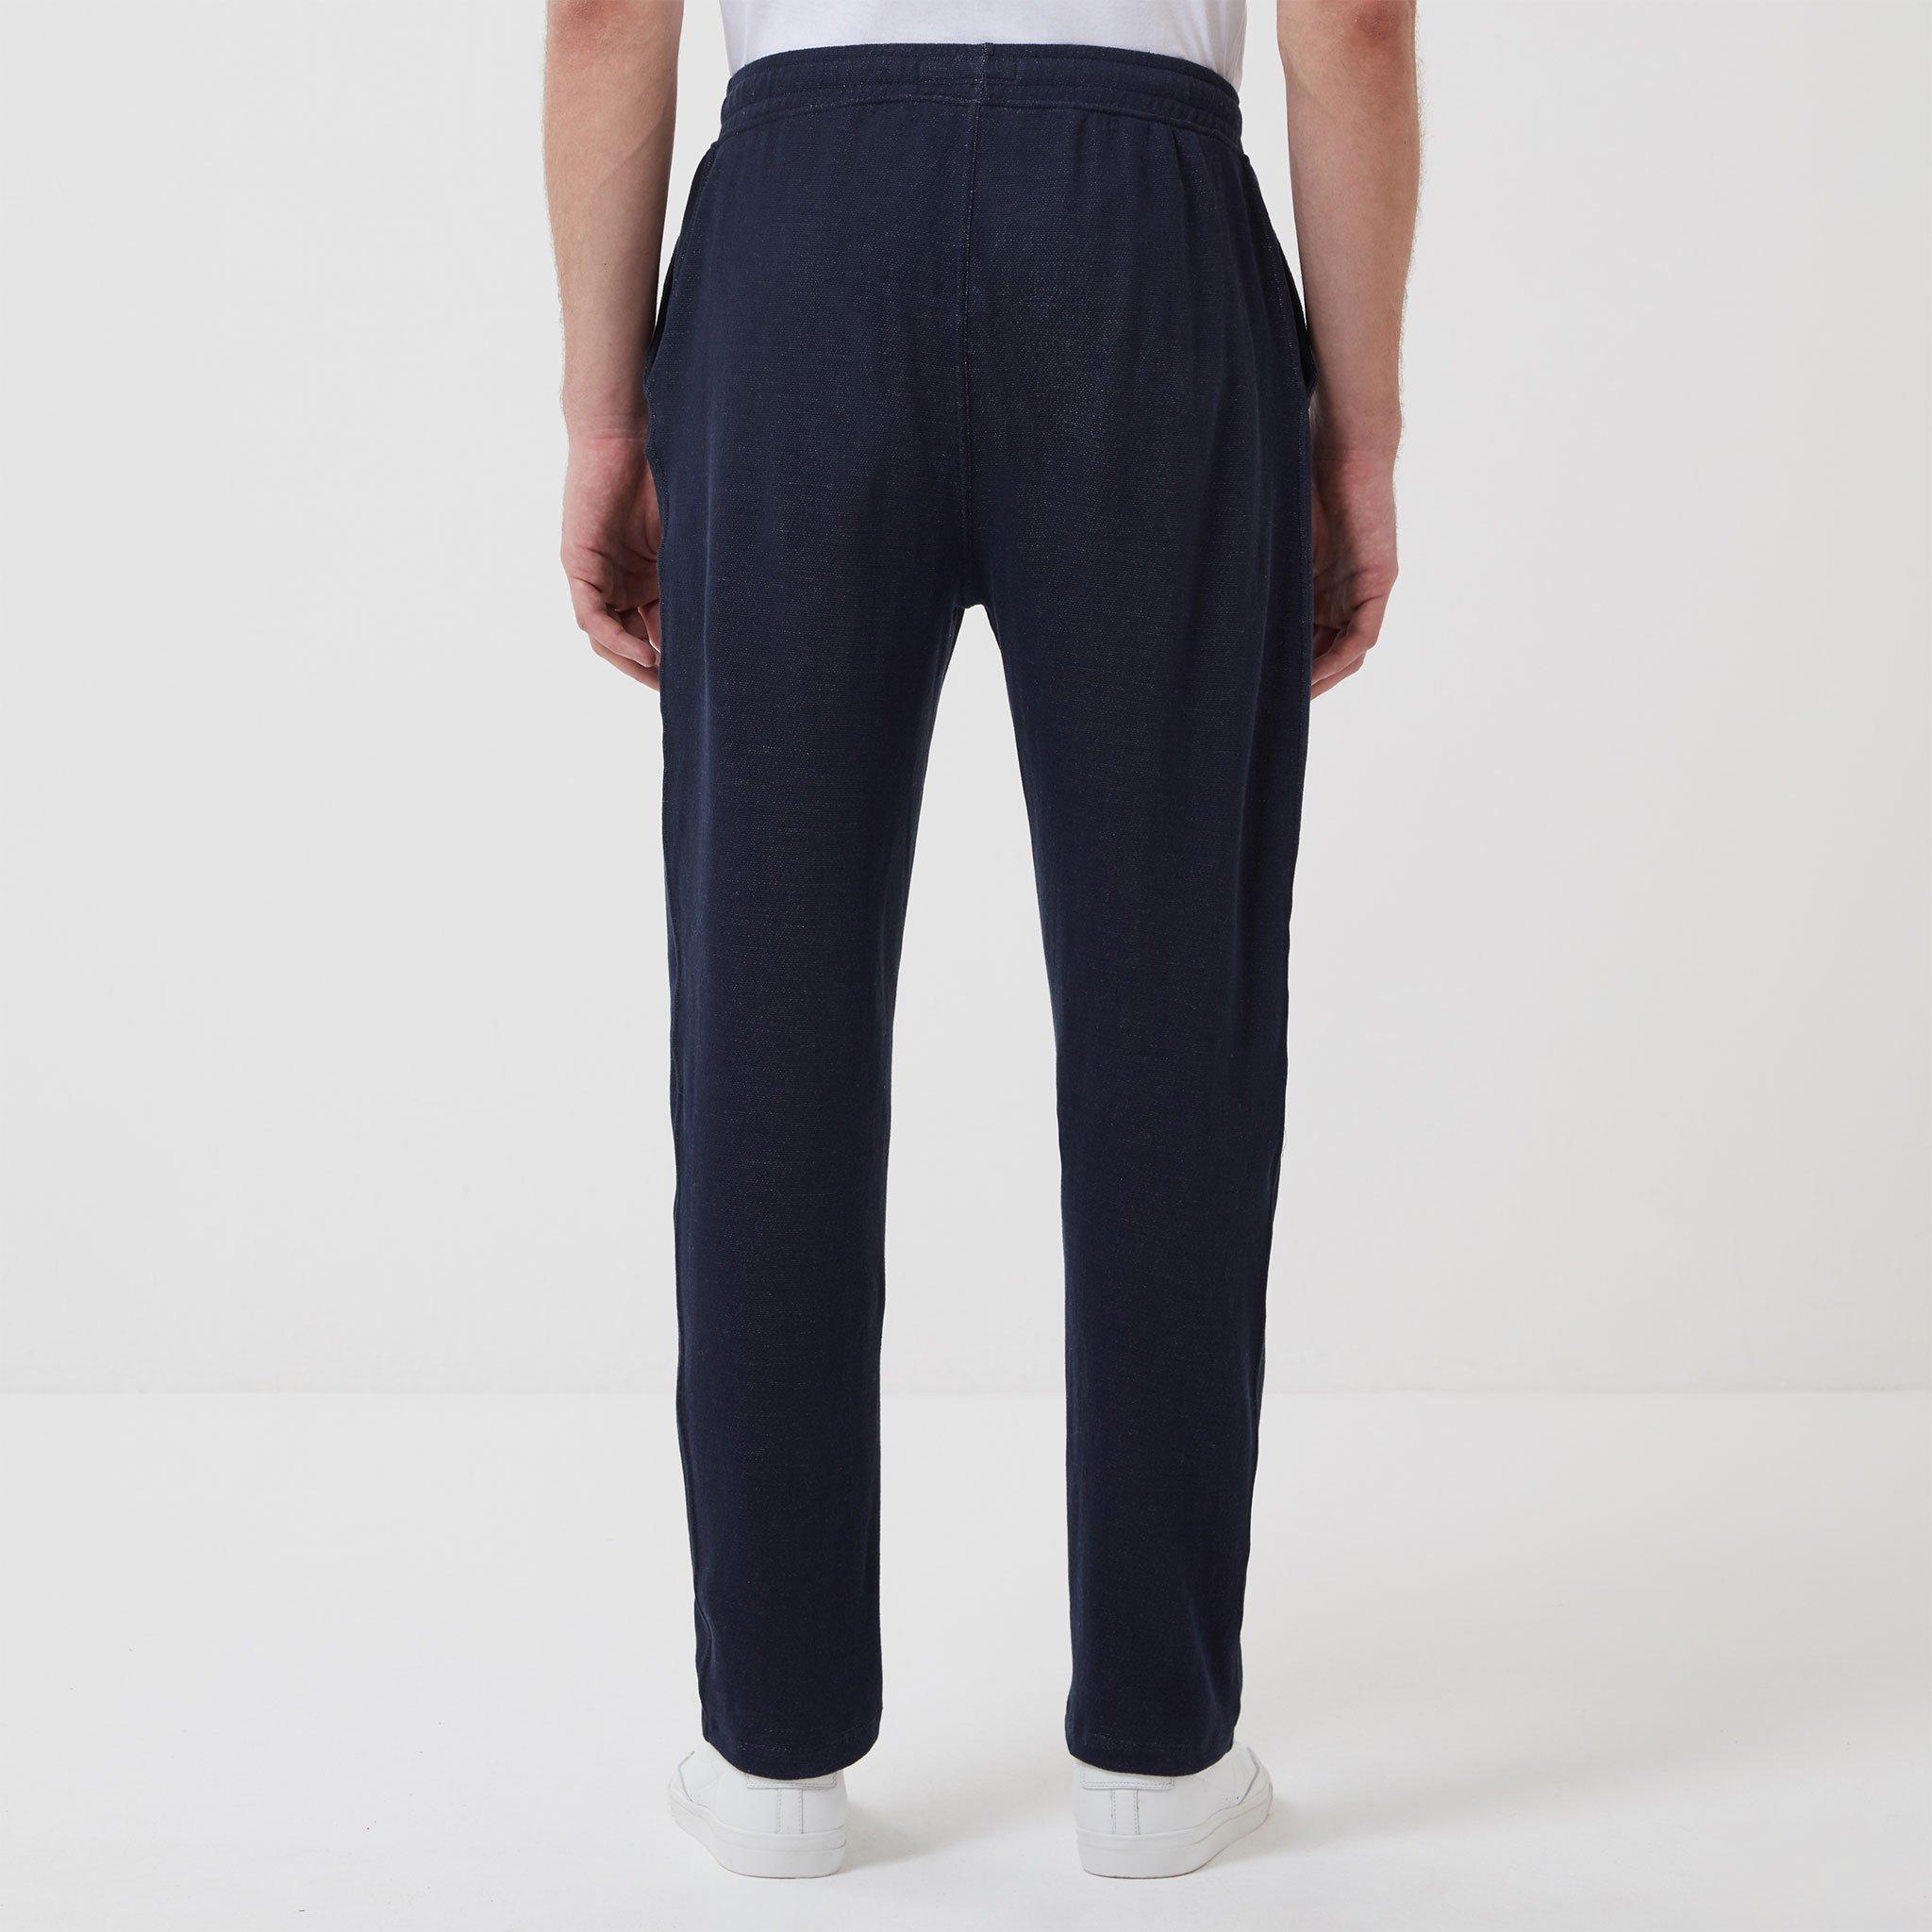 Timeout-Trousers-Navy-Model_03.jpg